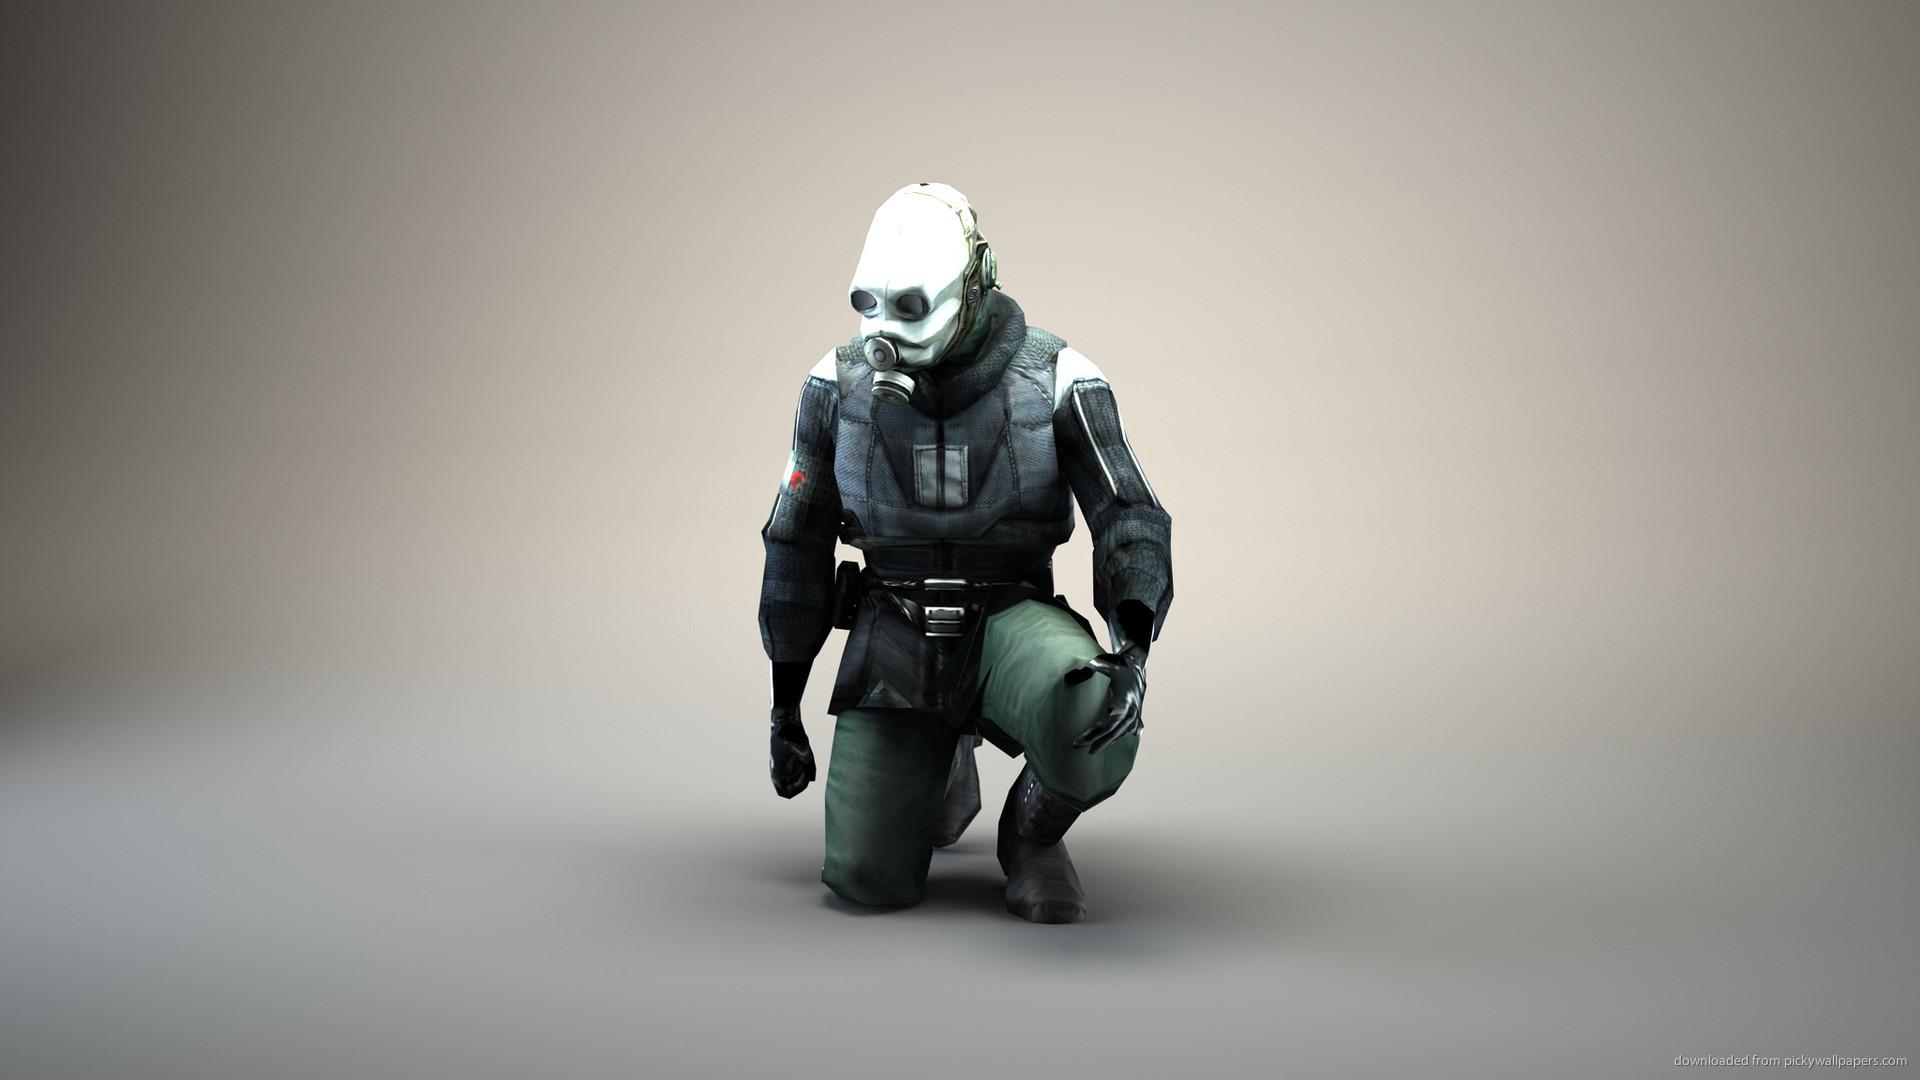 HD Half-Life City 17 Policeman render wallpaper